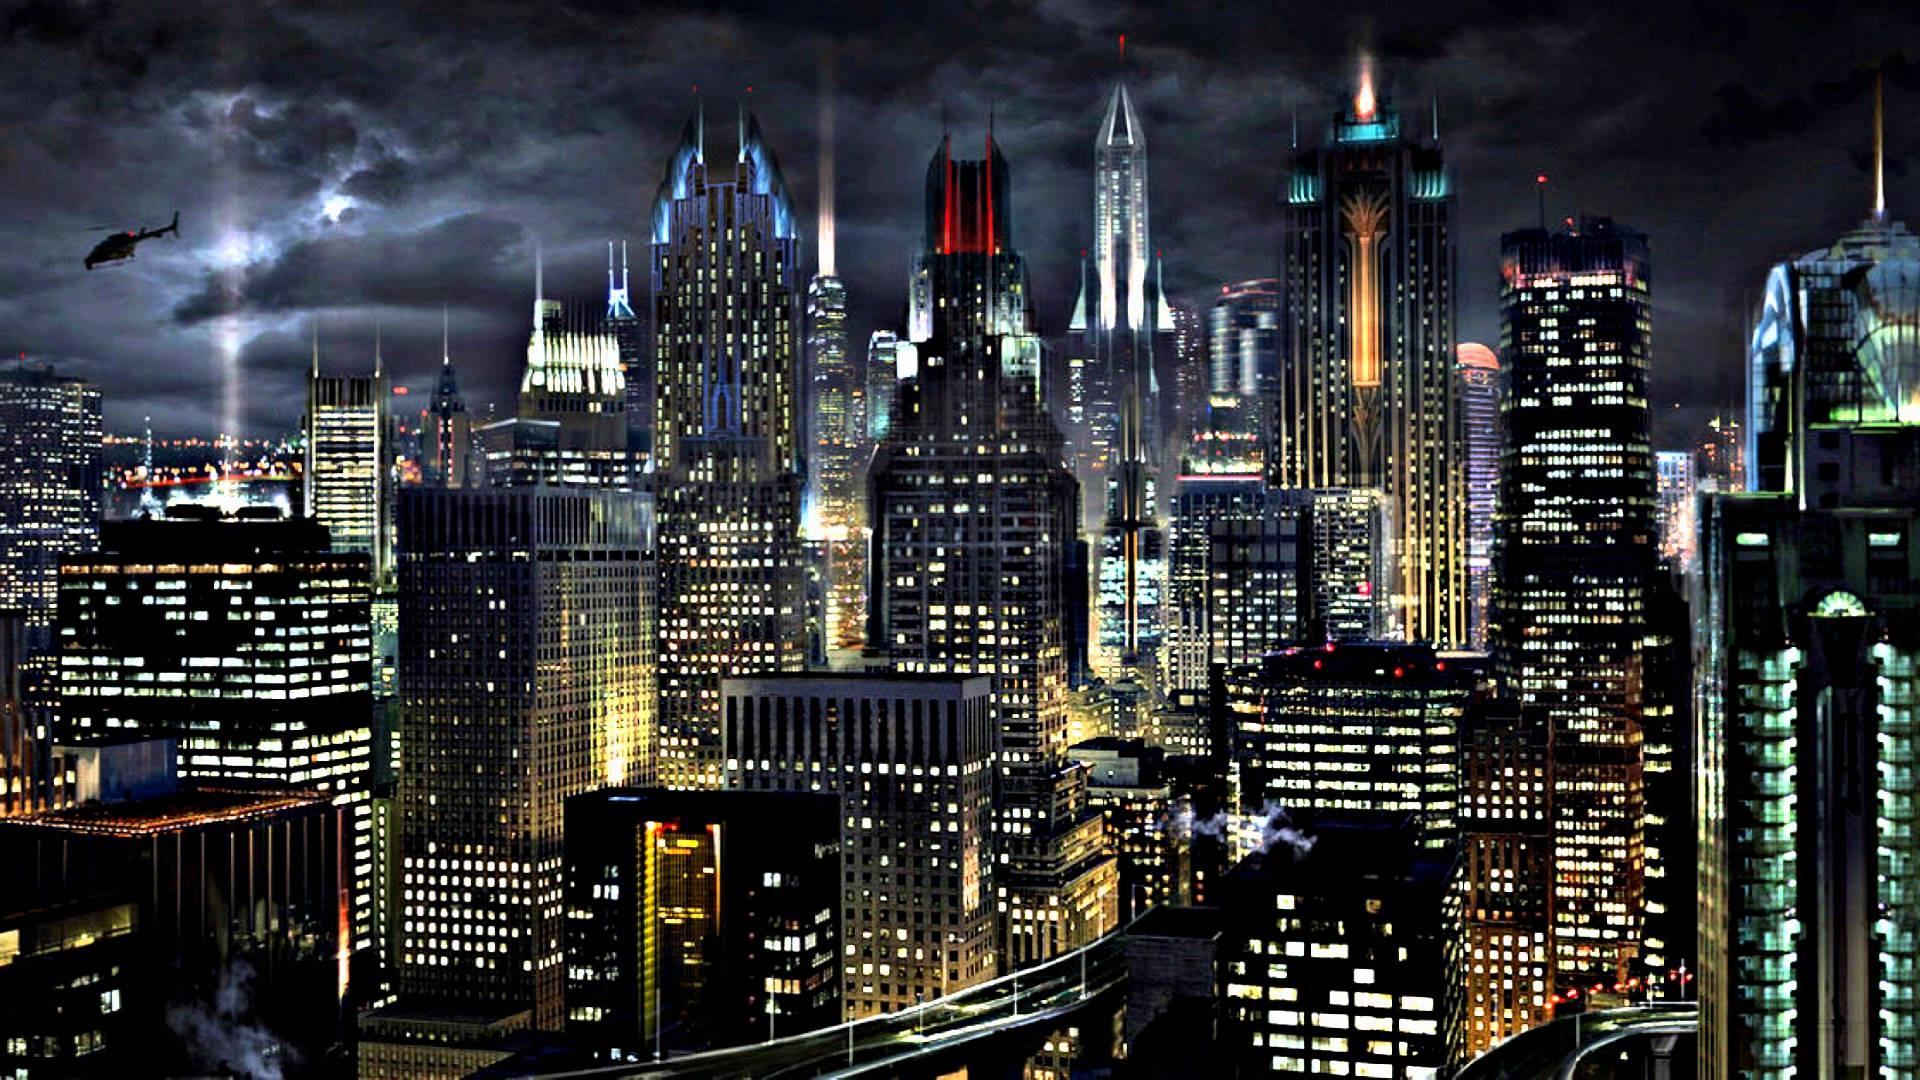 The Dark Knight Trilogy – Gotham City Theme